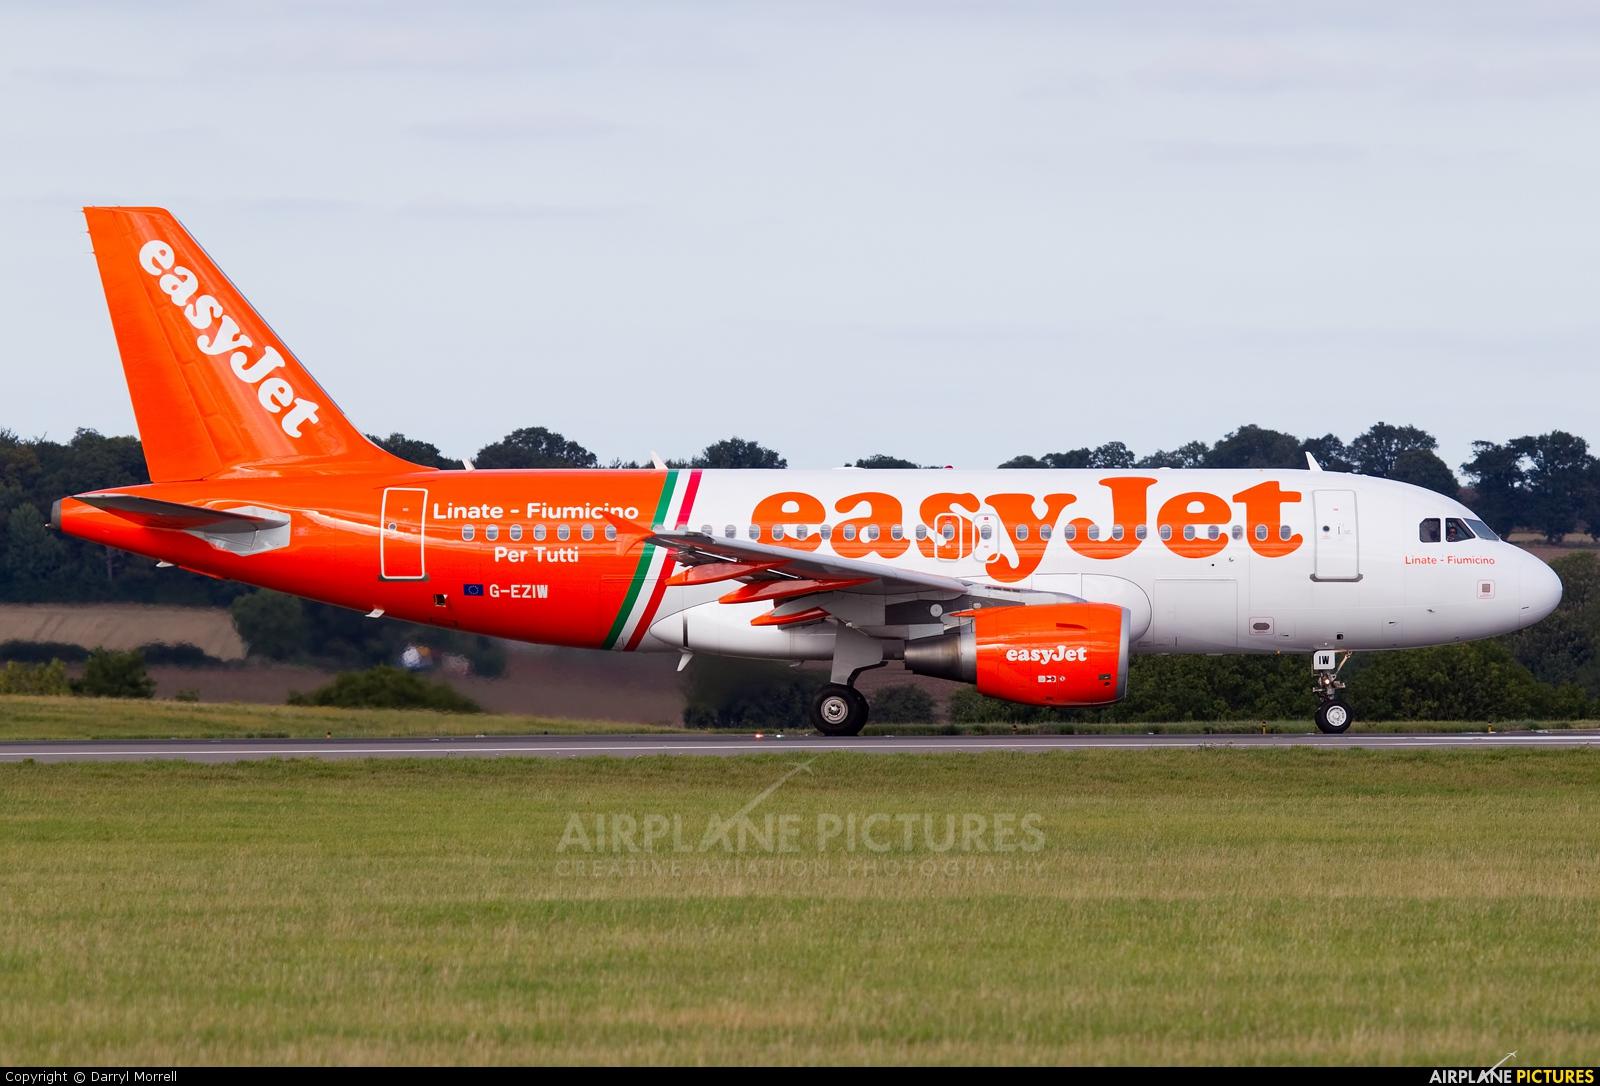 easyJet G-EZIW aircraft at London - Luton